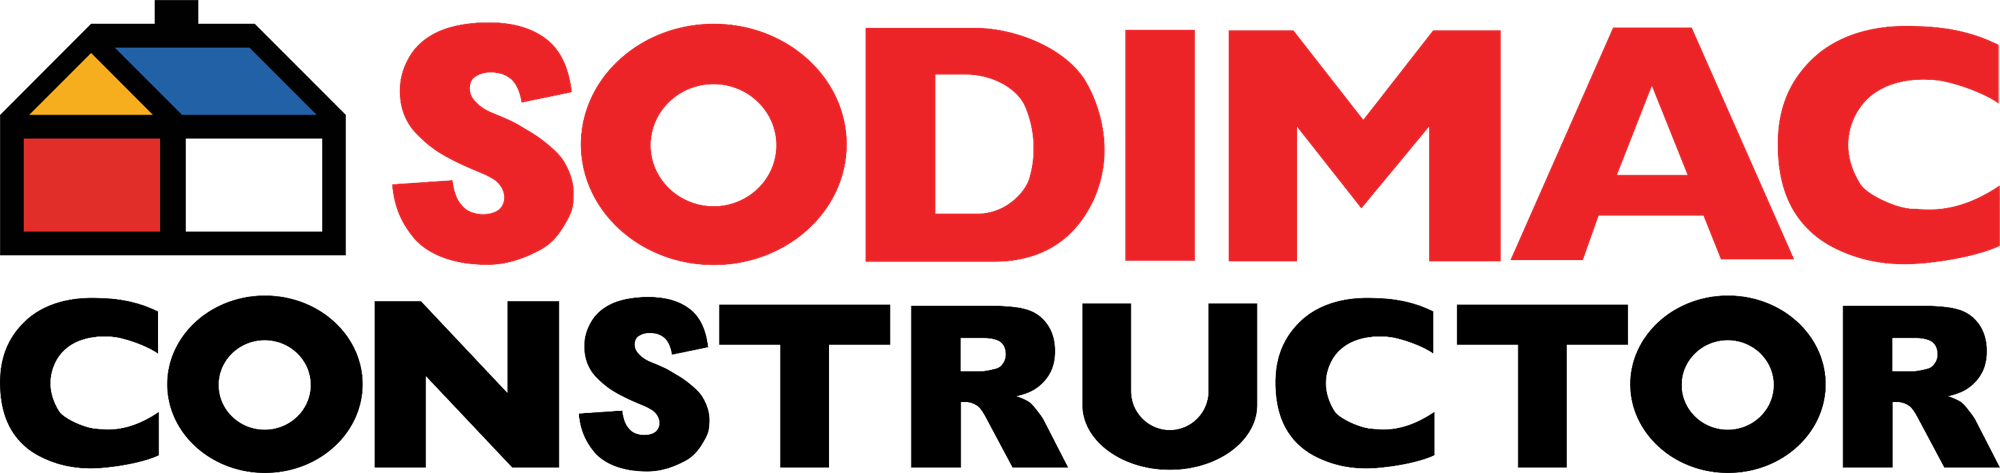 Sodimac Constructor (Argentina)